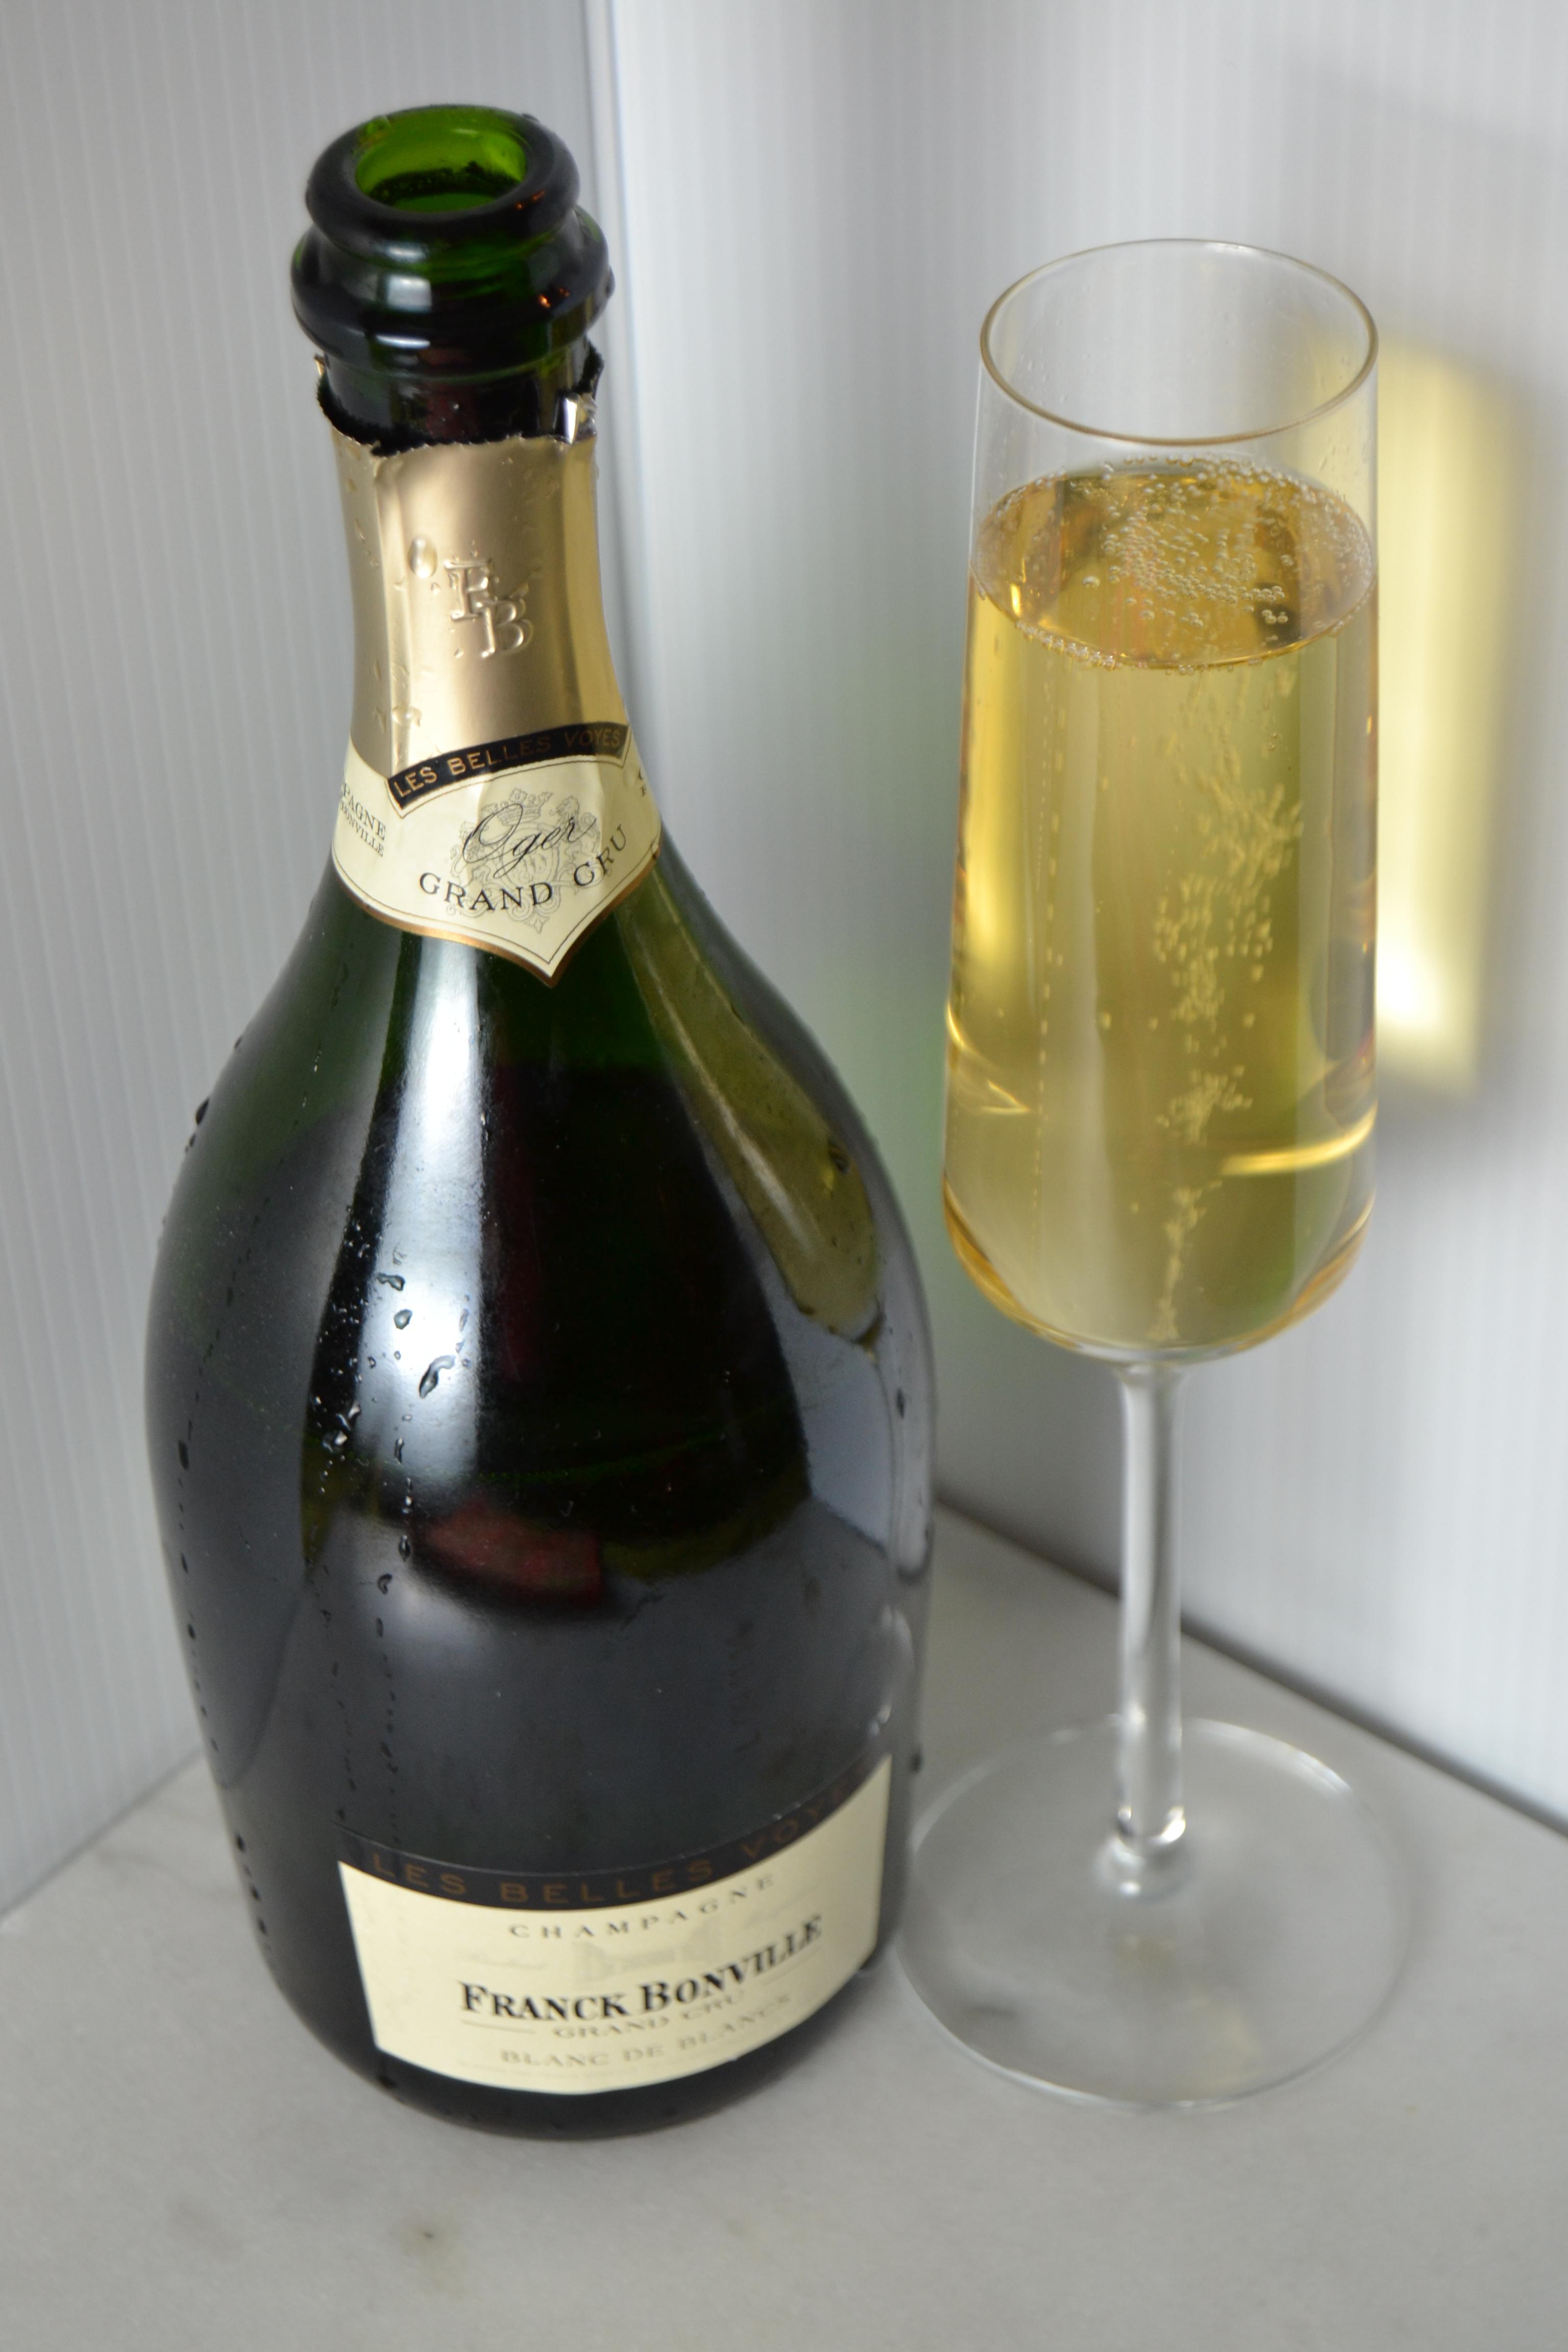 Champagne & bourbon 073